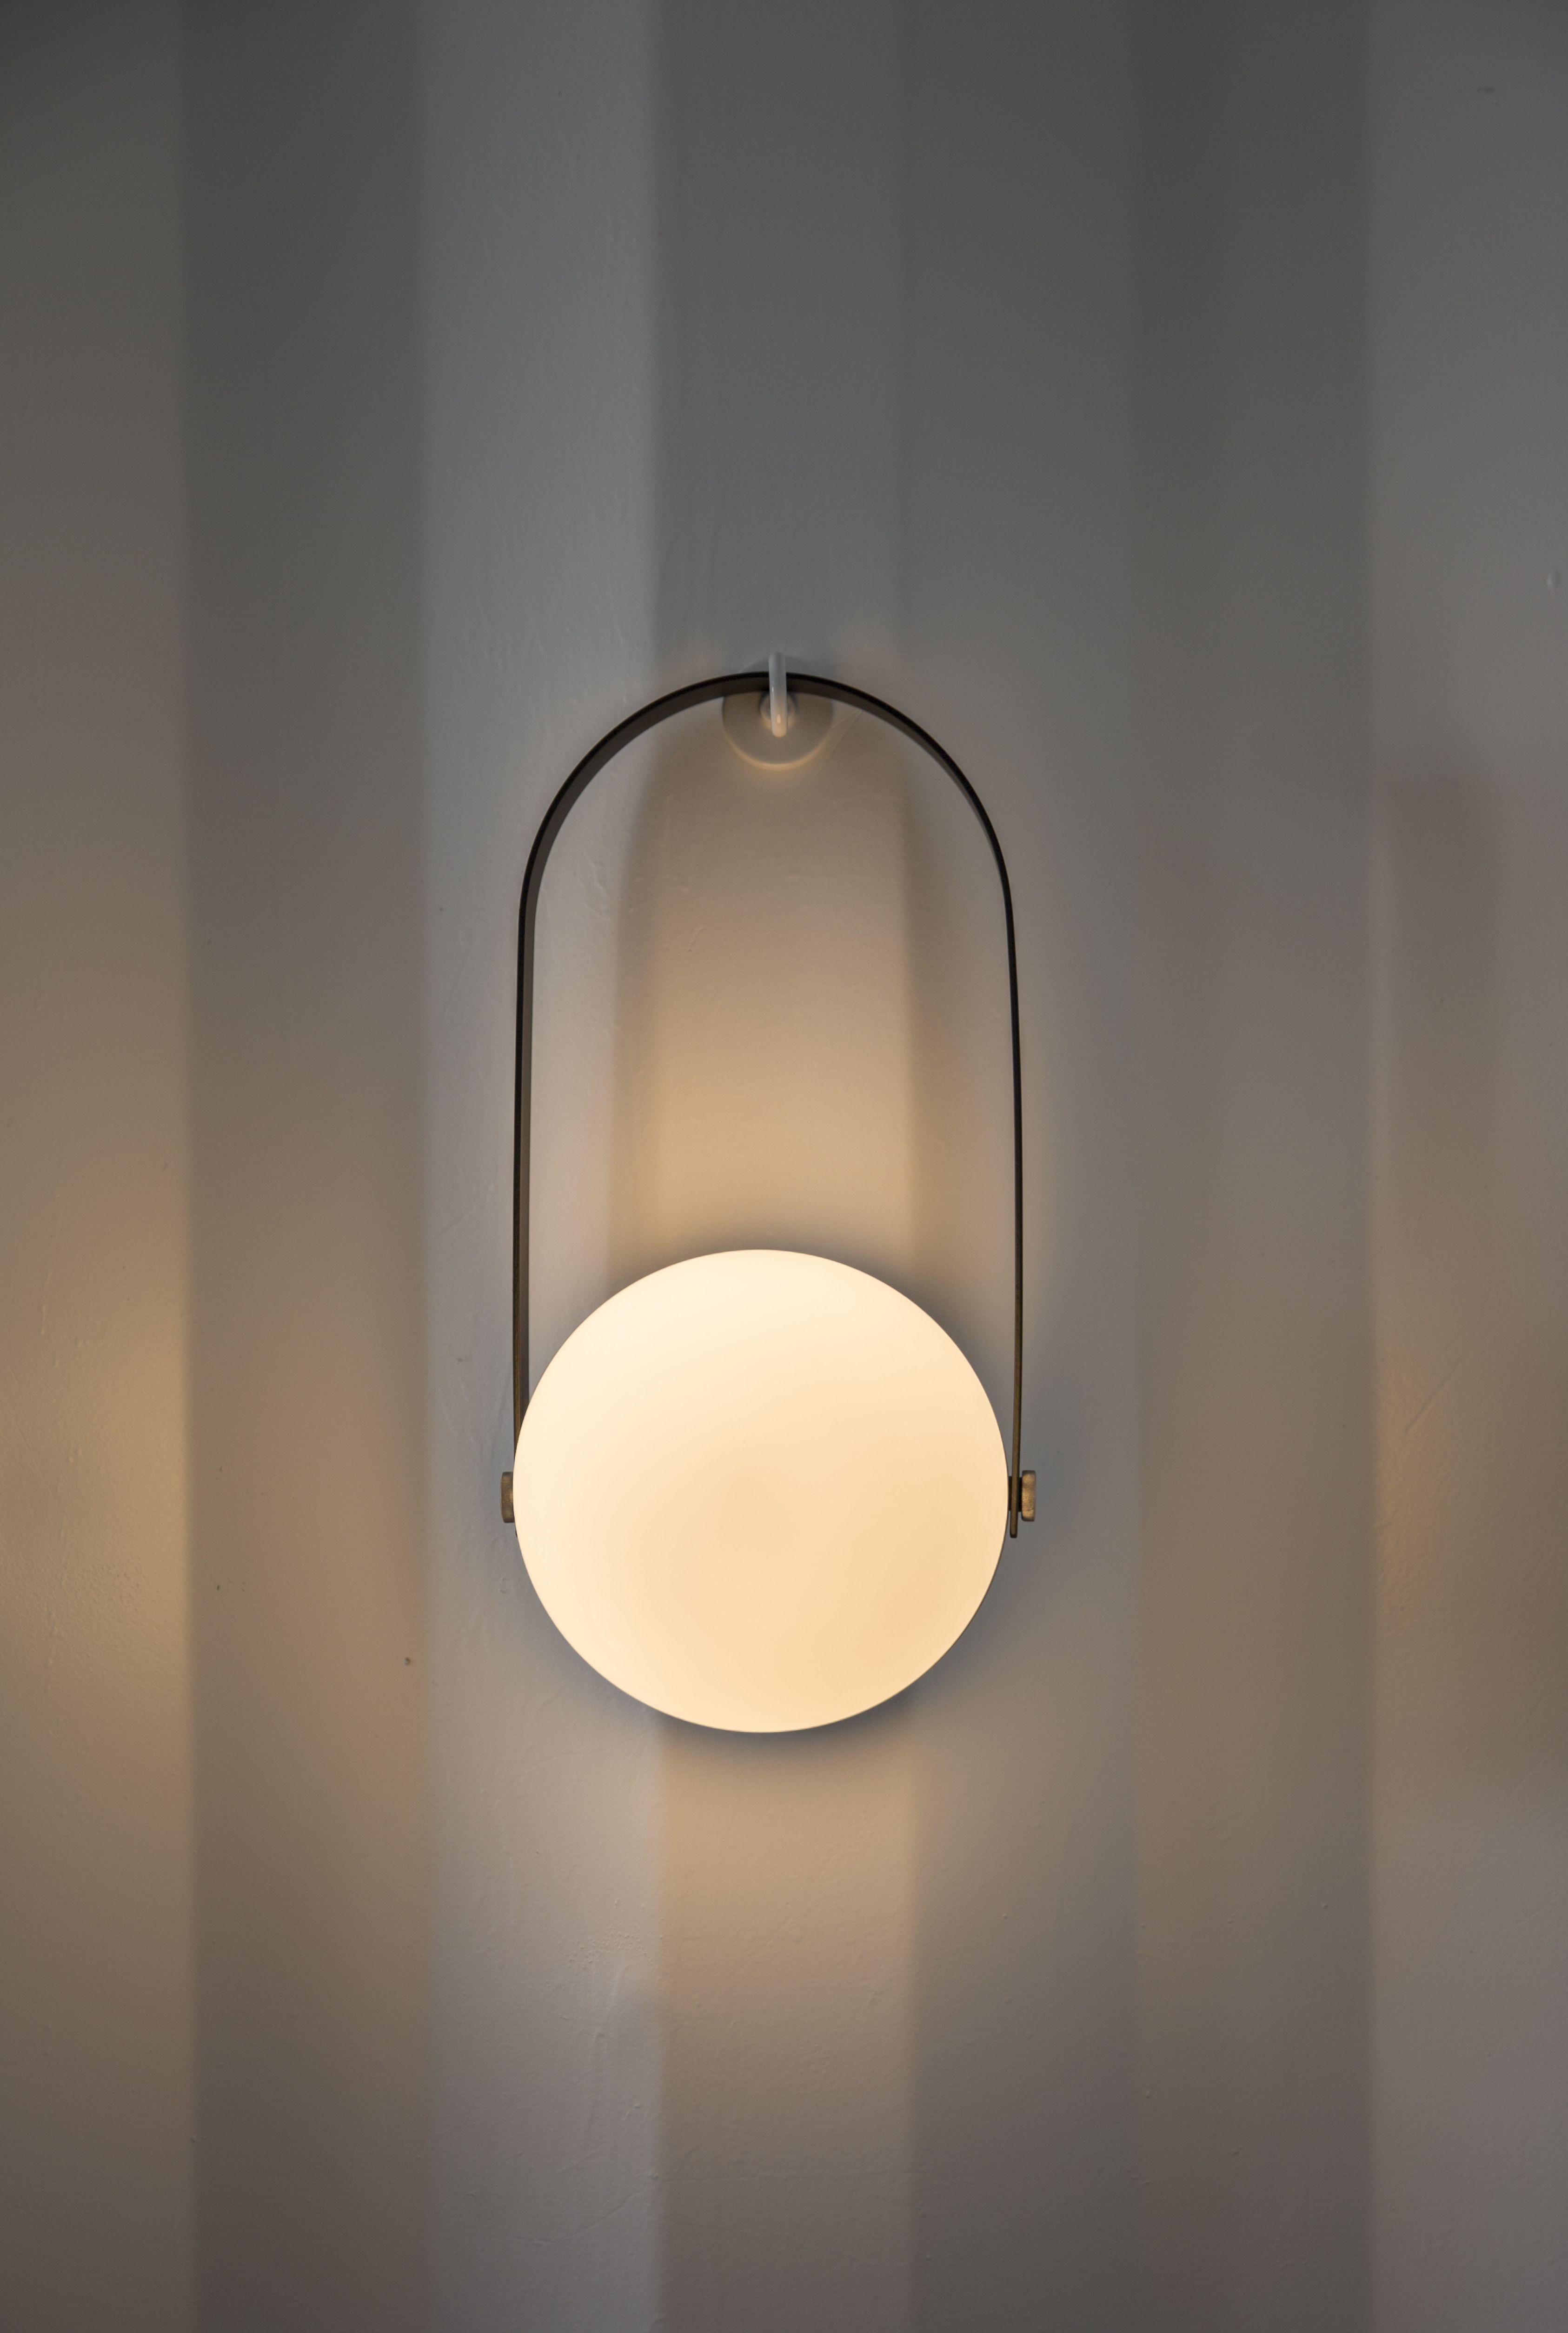 design wall lamp